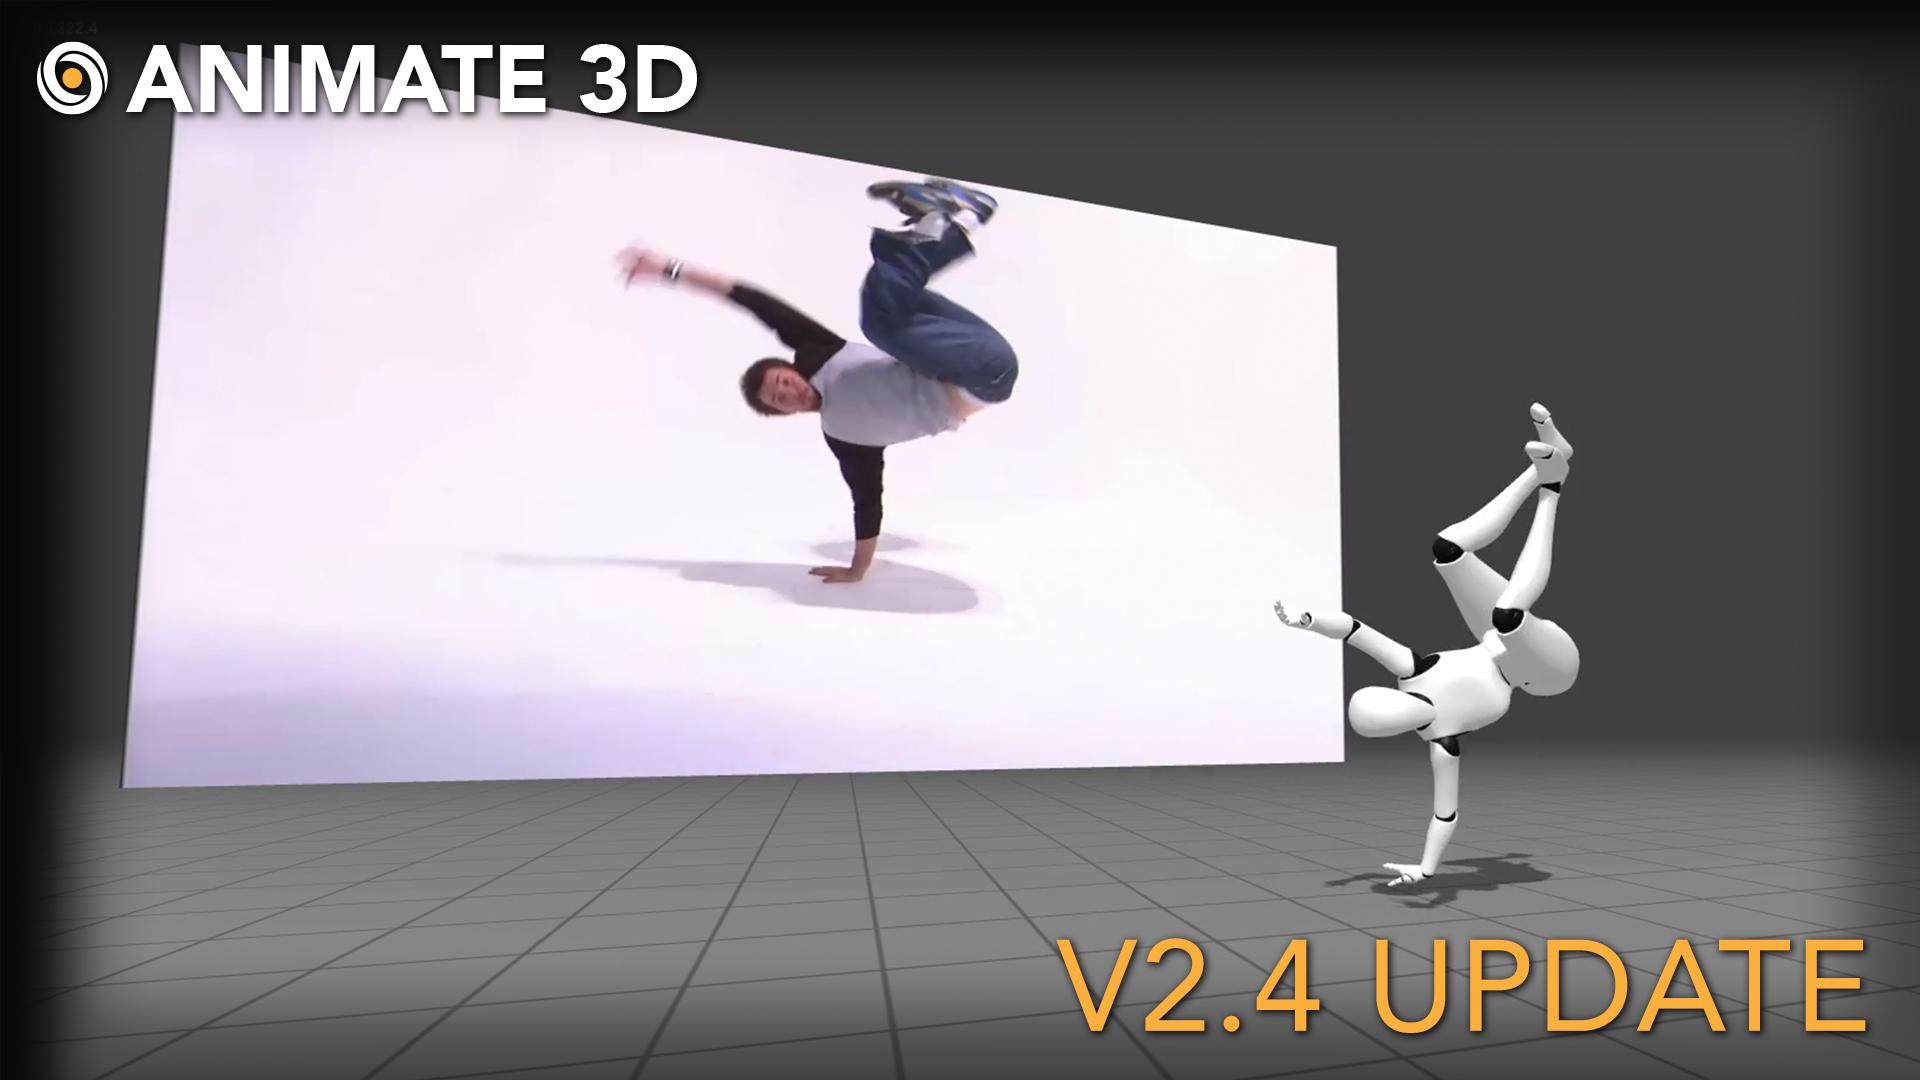 Animate 3D - V2.4 Release